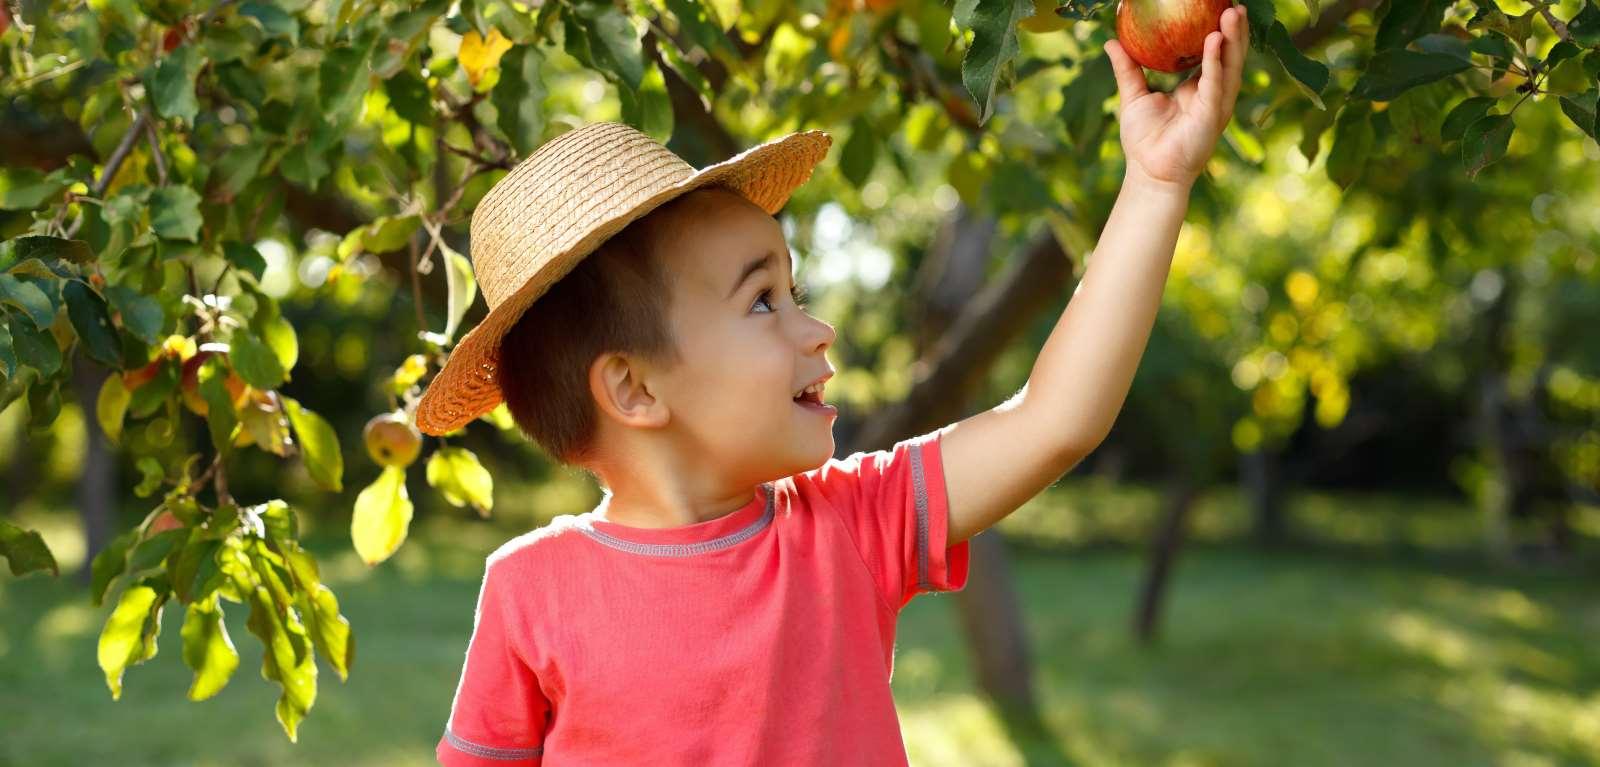 Fruit & Vegetable Picking